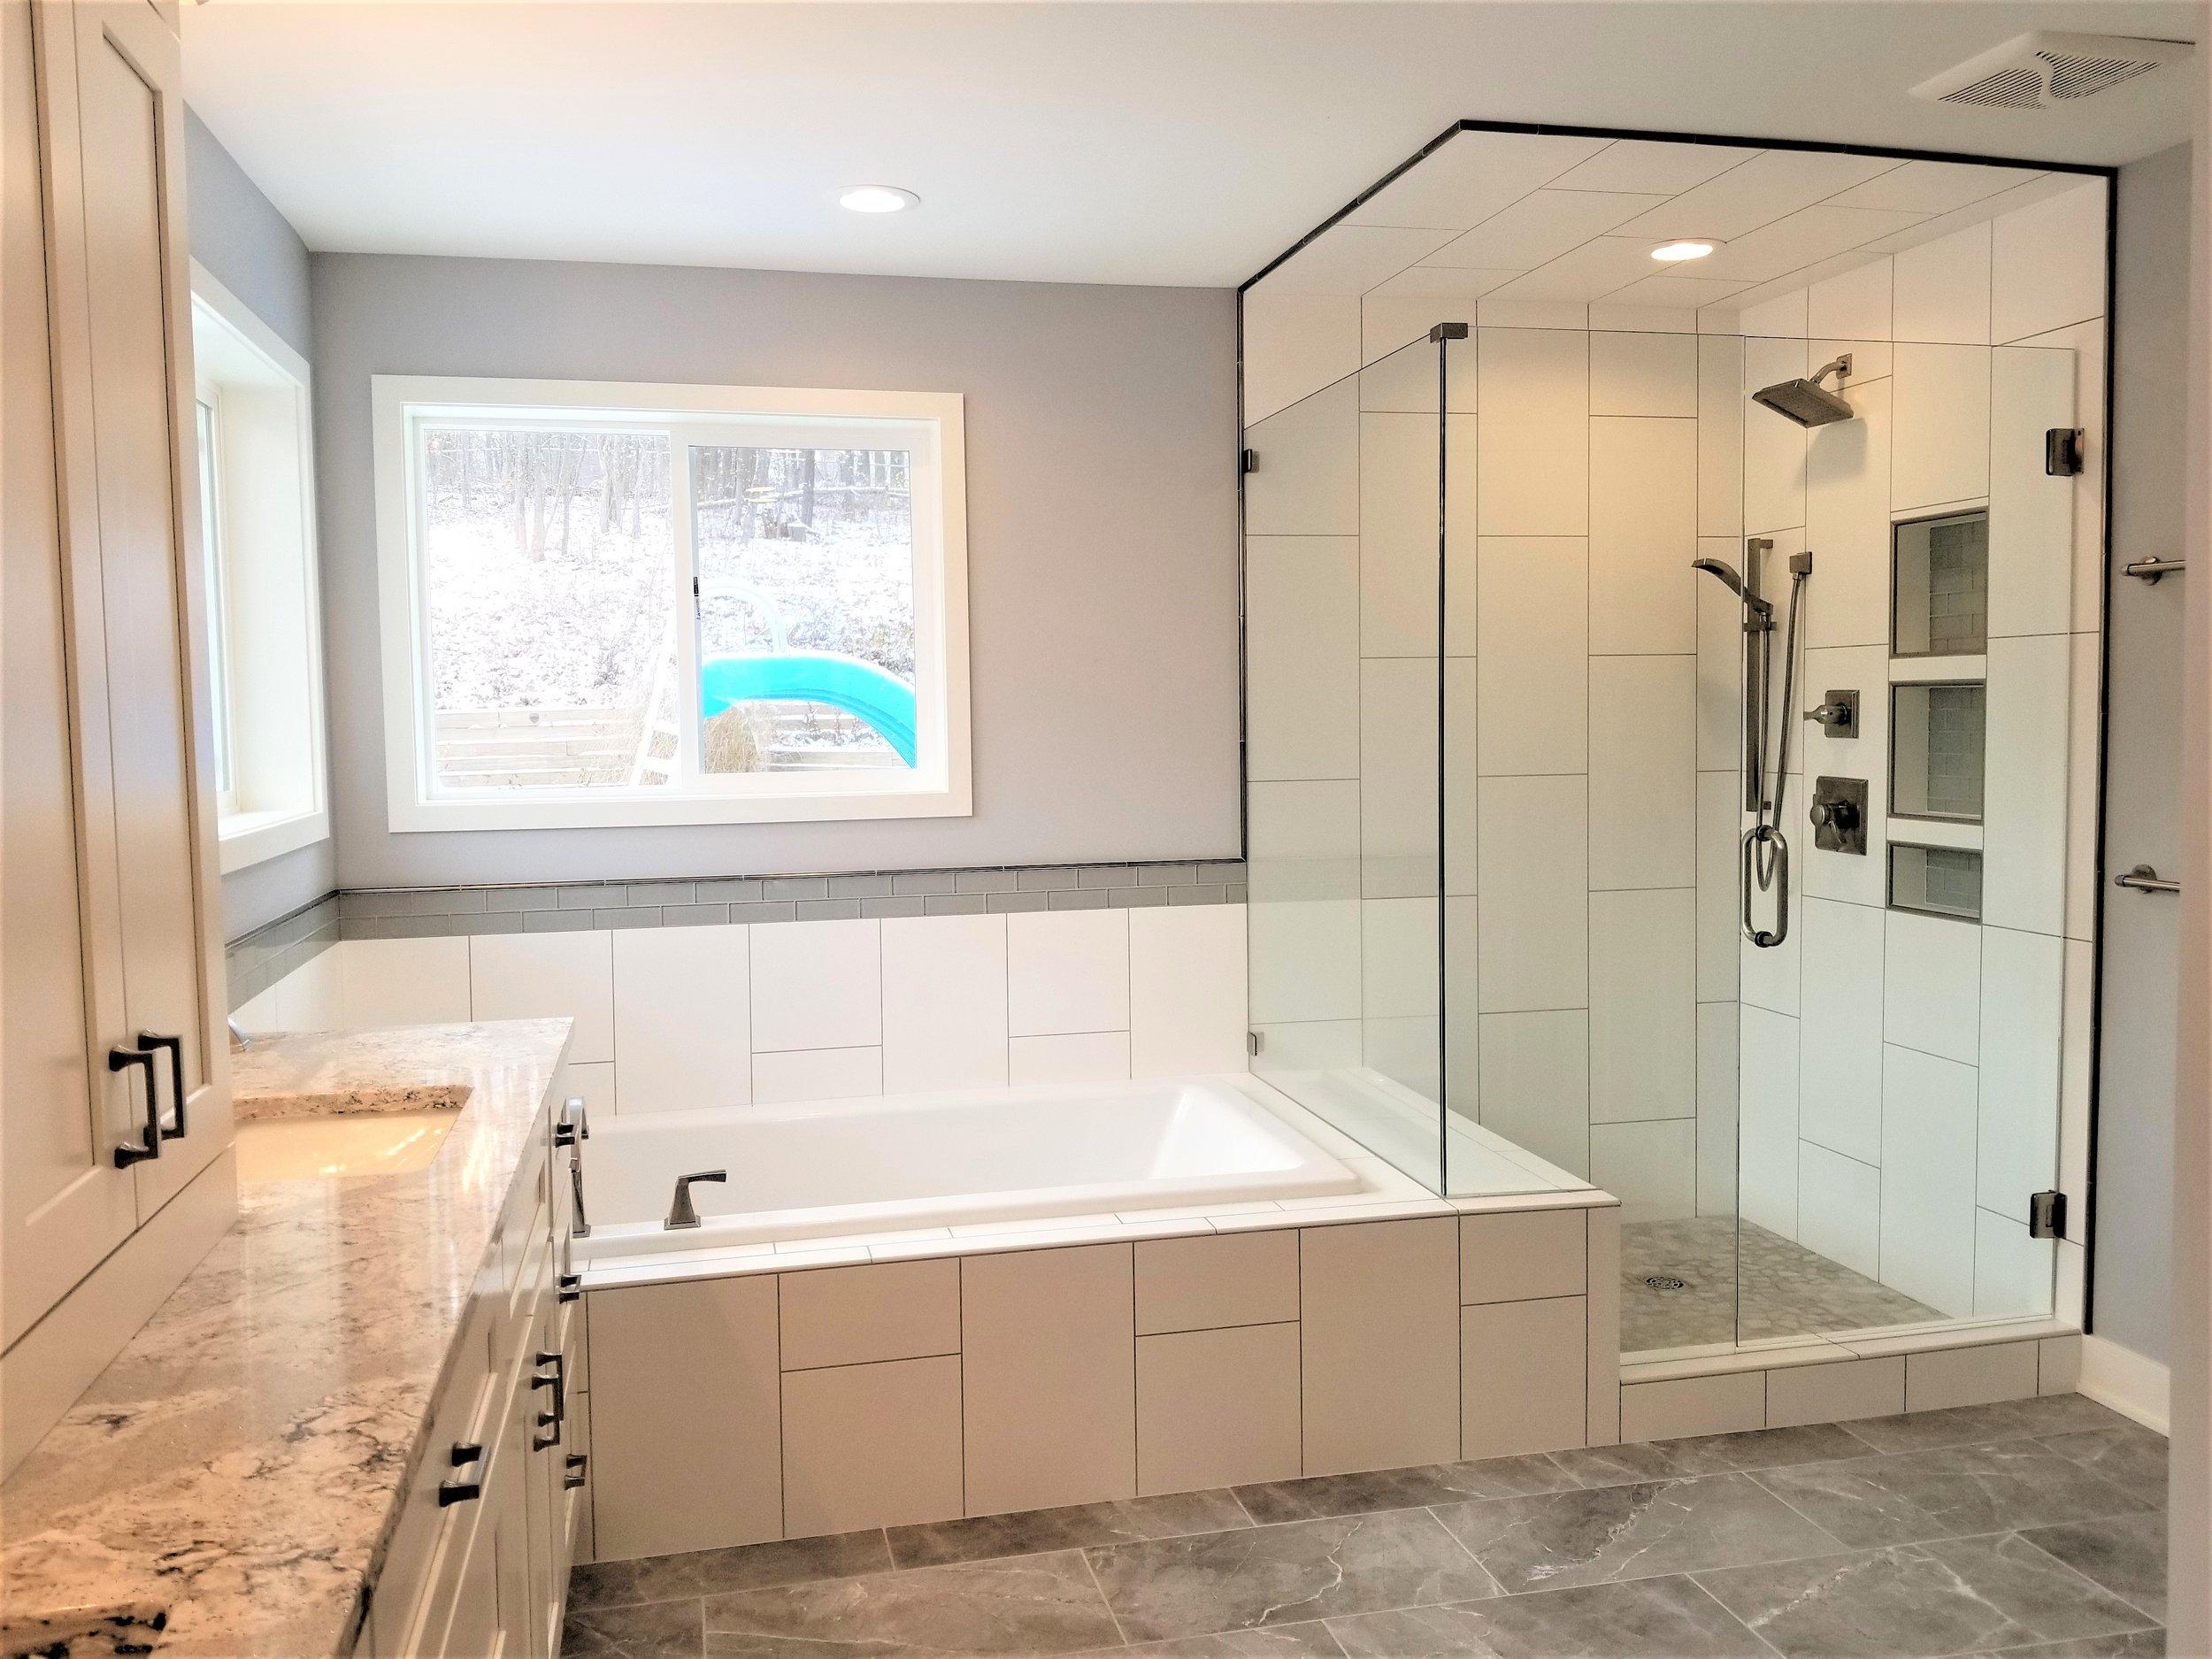 HIldebrand Bathroom 2 (2).jpg